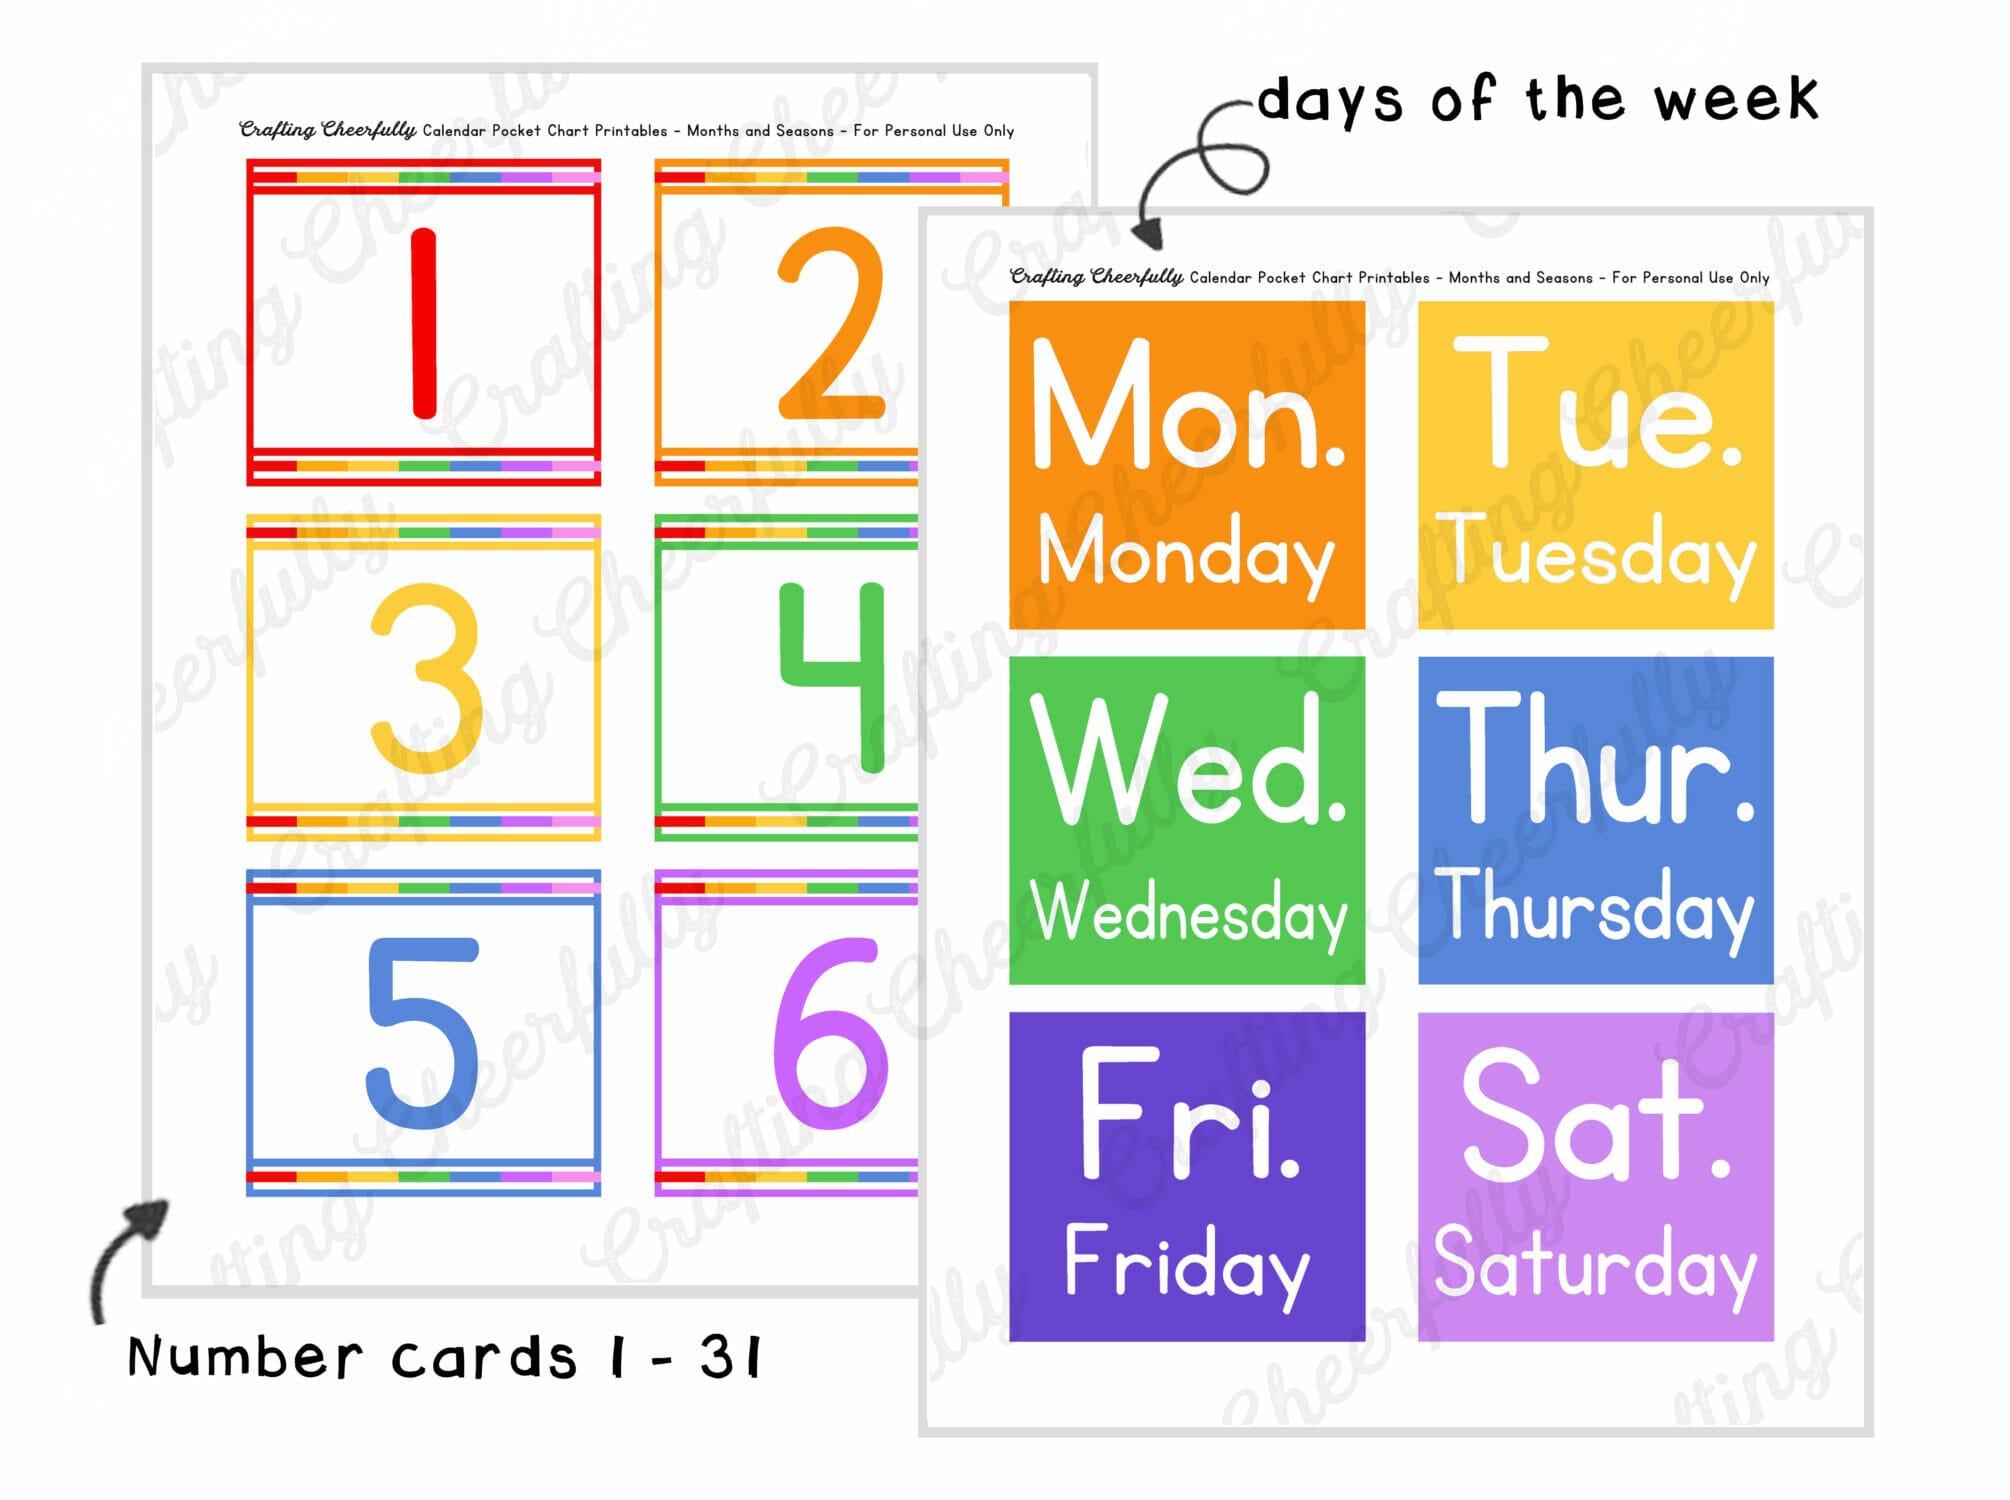 Pocket chart calendar printables.